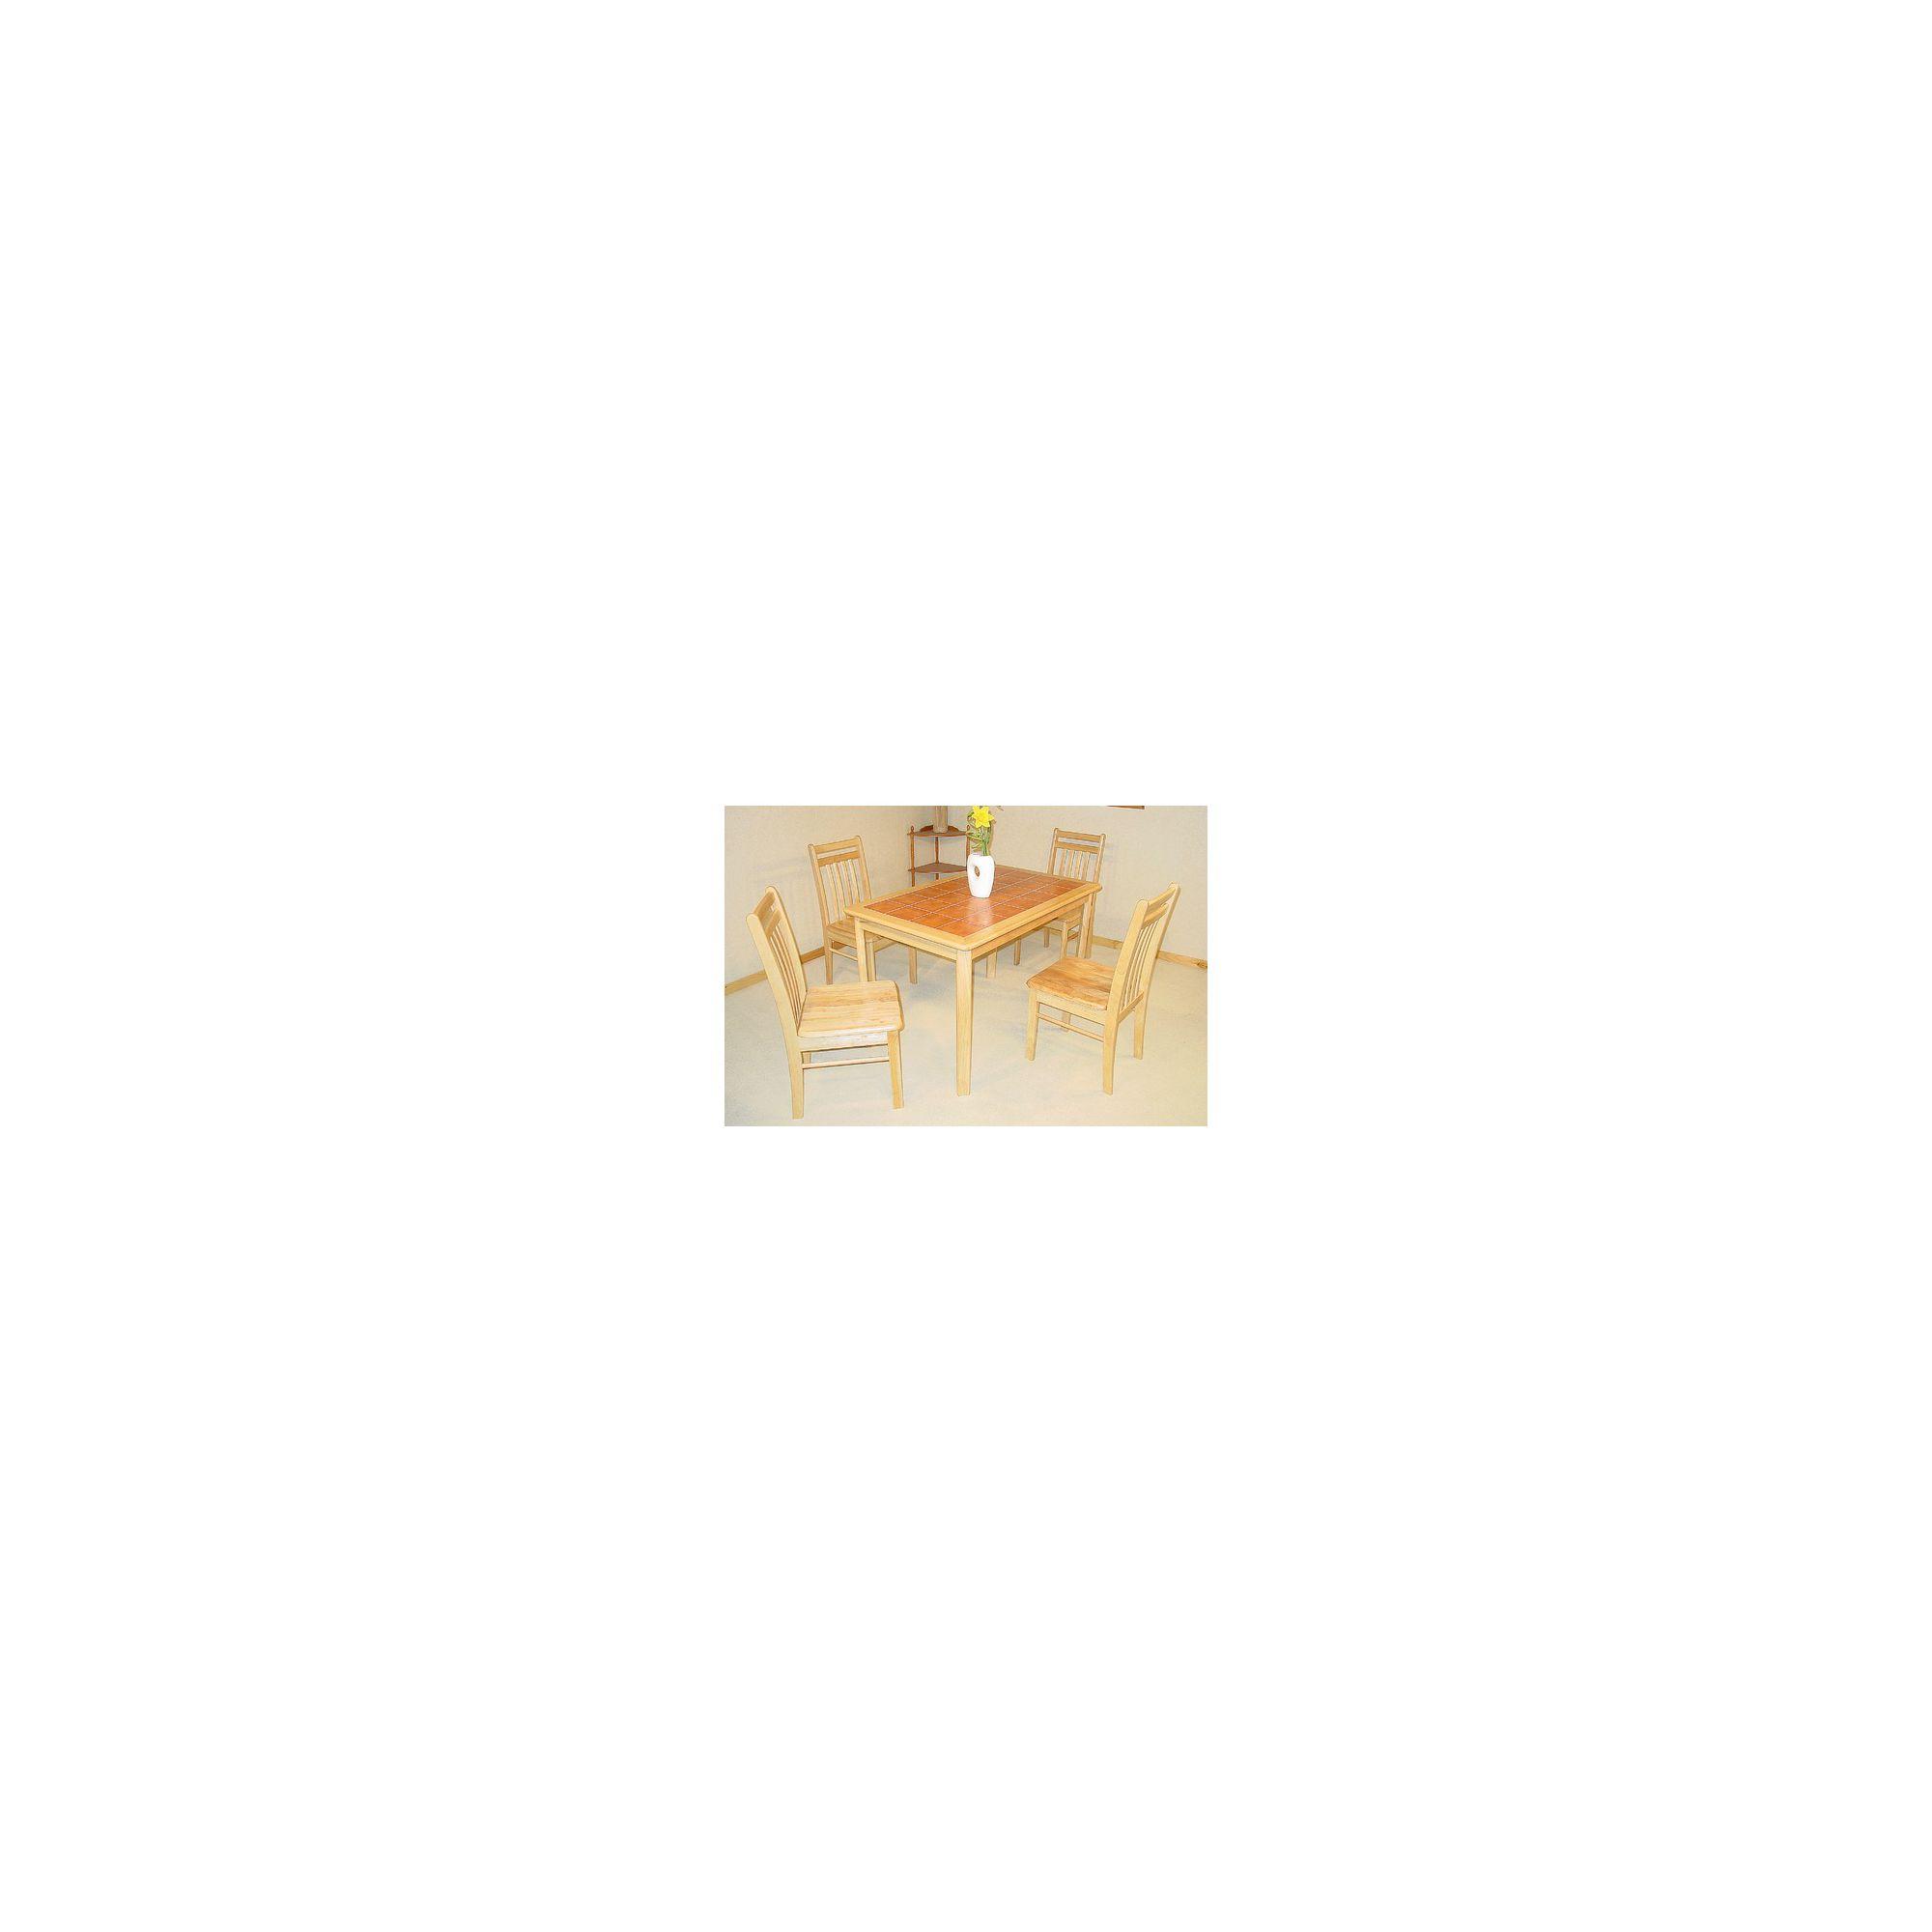 Heartlands Tiletop 5 Piece Dining Set - Terracotta at Tesco Direct